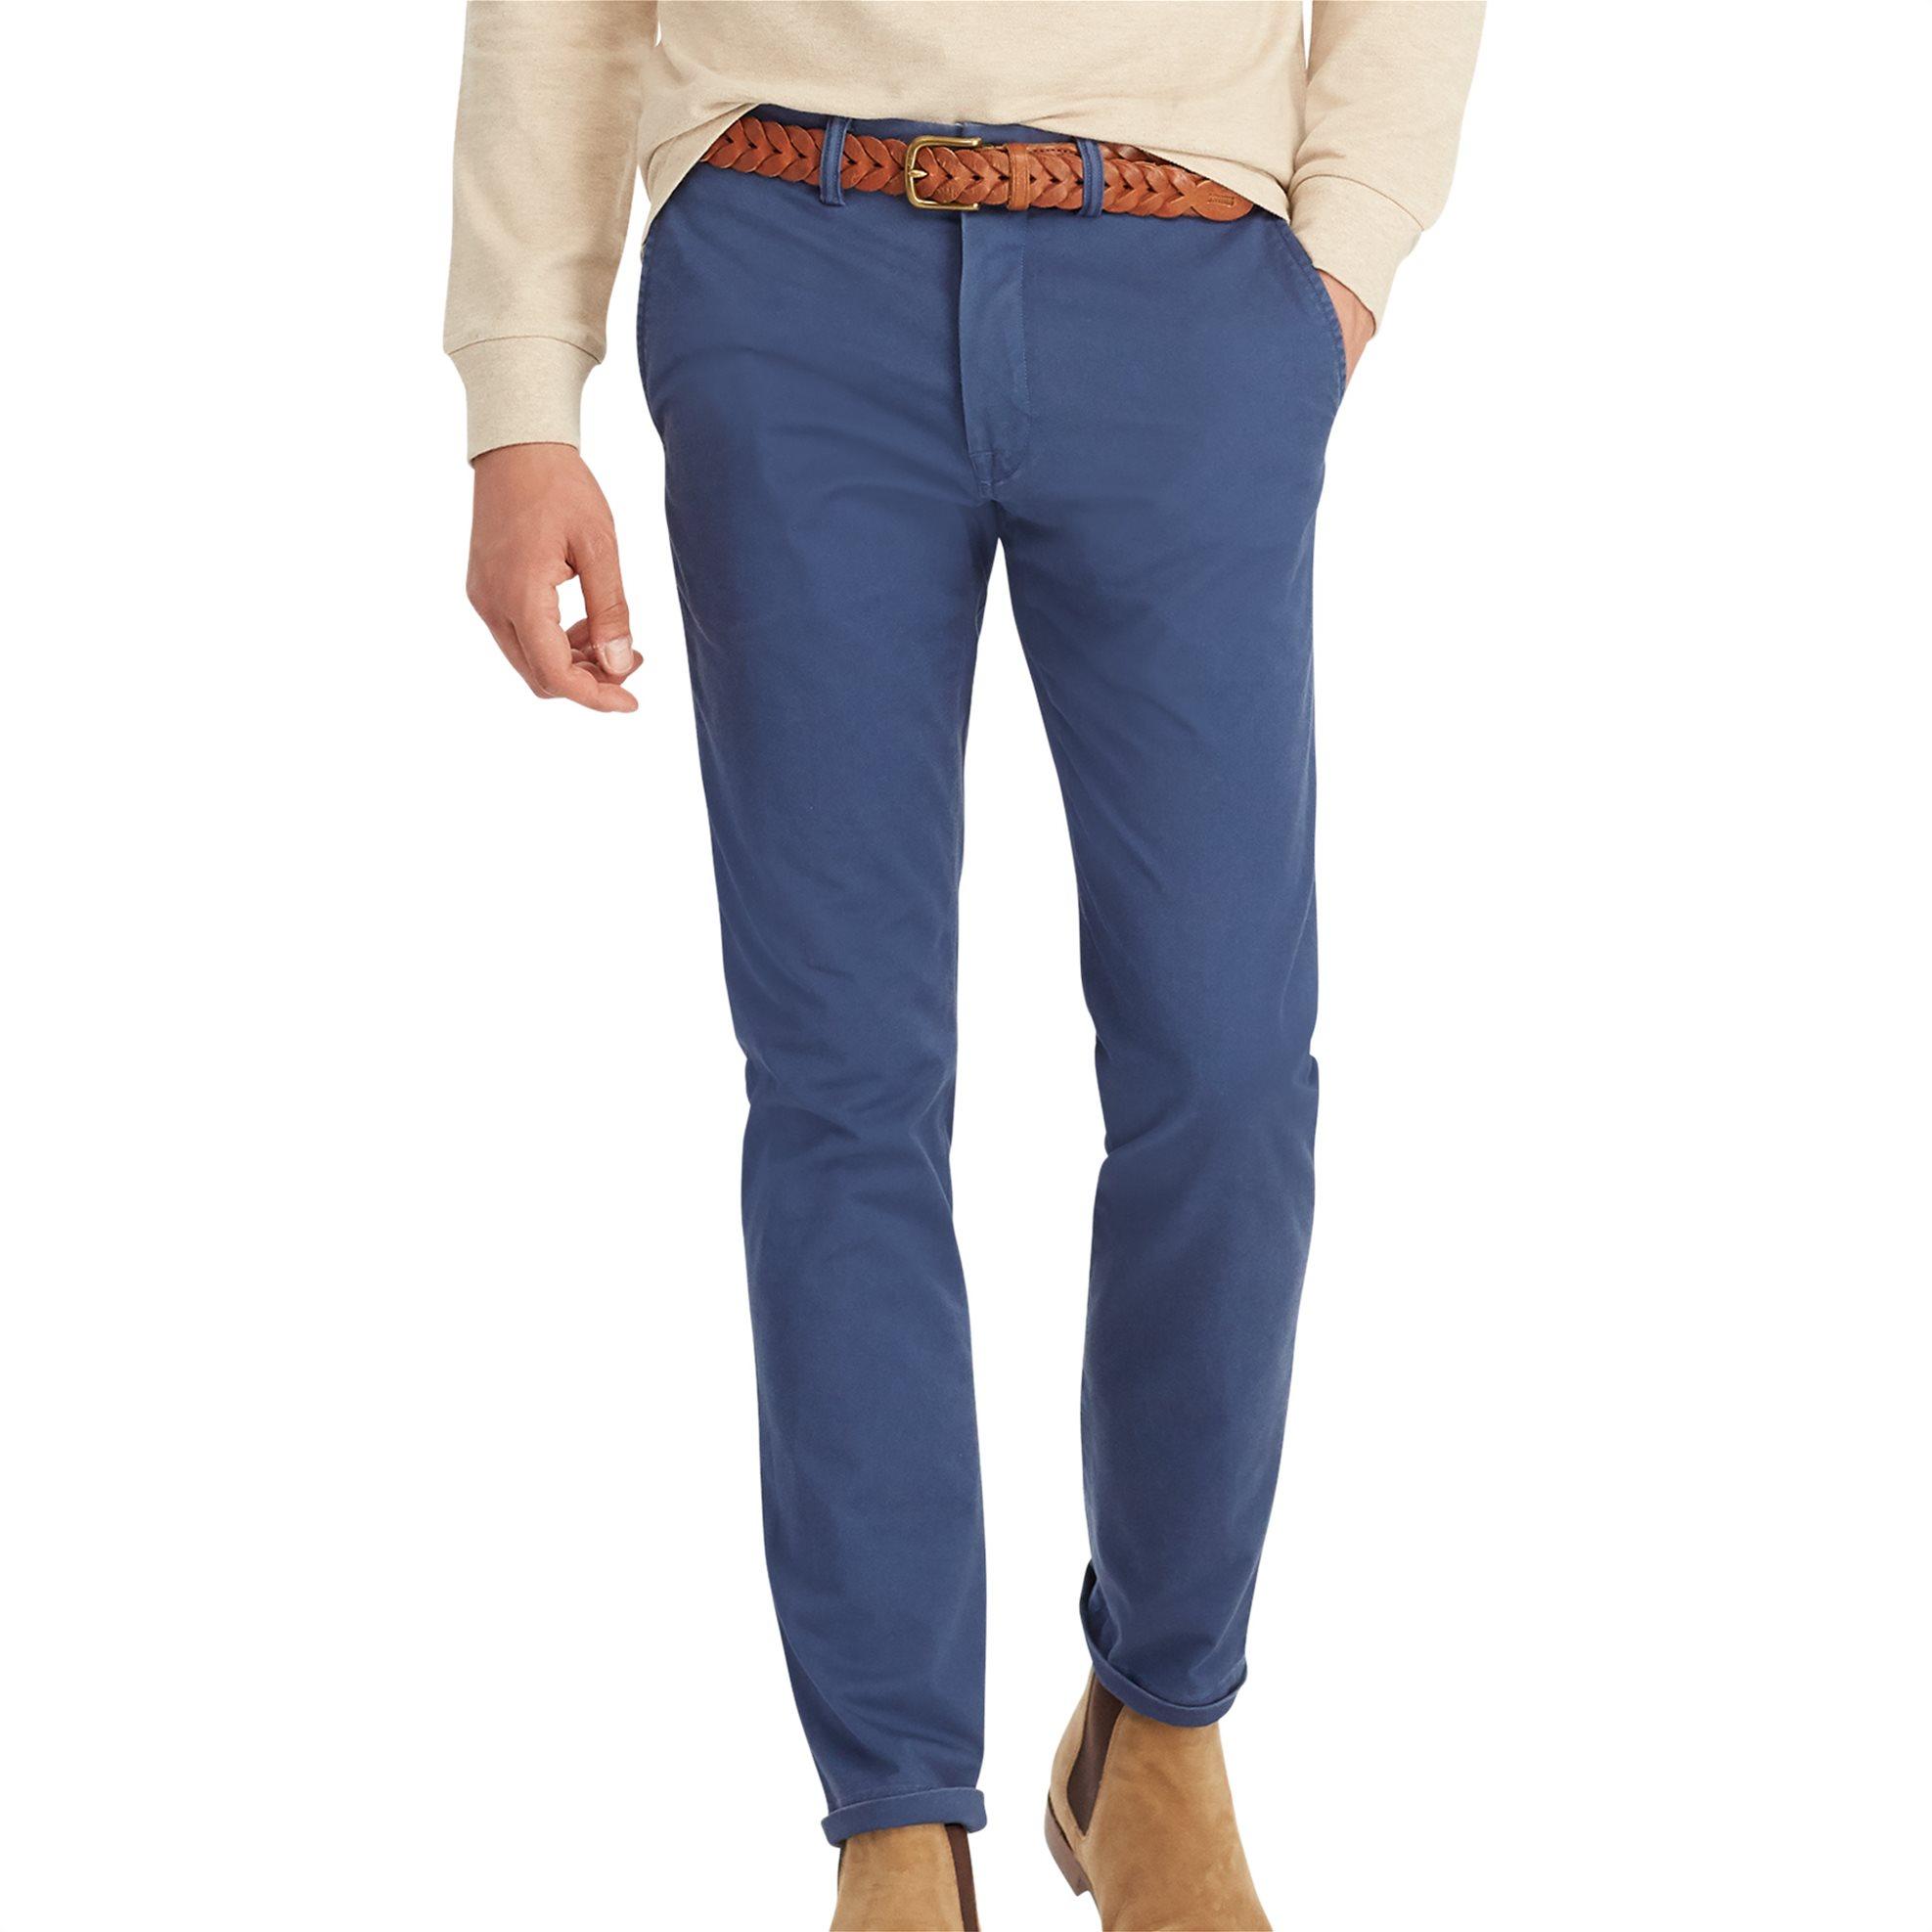 Polo Ralph Lauren ανδρικό παντελόνι μπλε Stretch Slim Fit Cotton Chino - 7107041 ανδρασ   ρουχα   παντελόνια   chinos